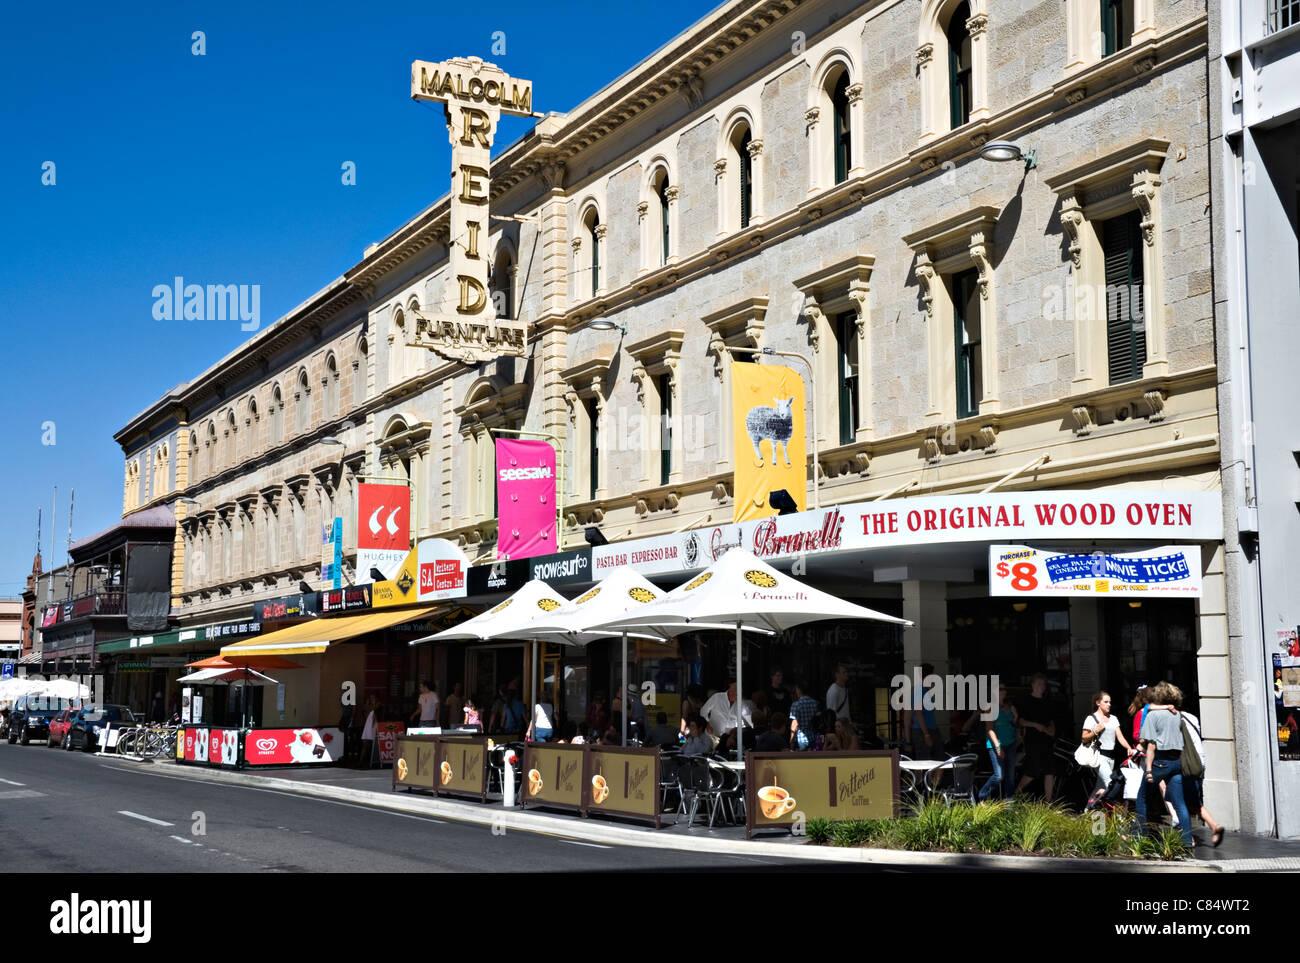 Cafe Rundle Street Adelaide